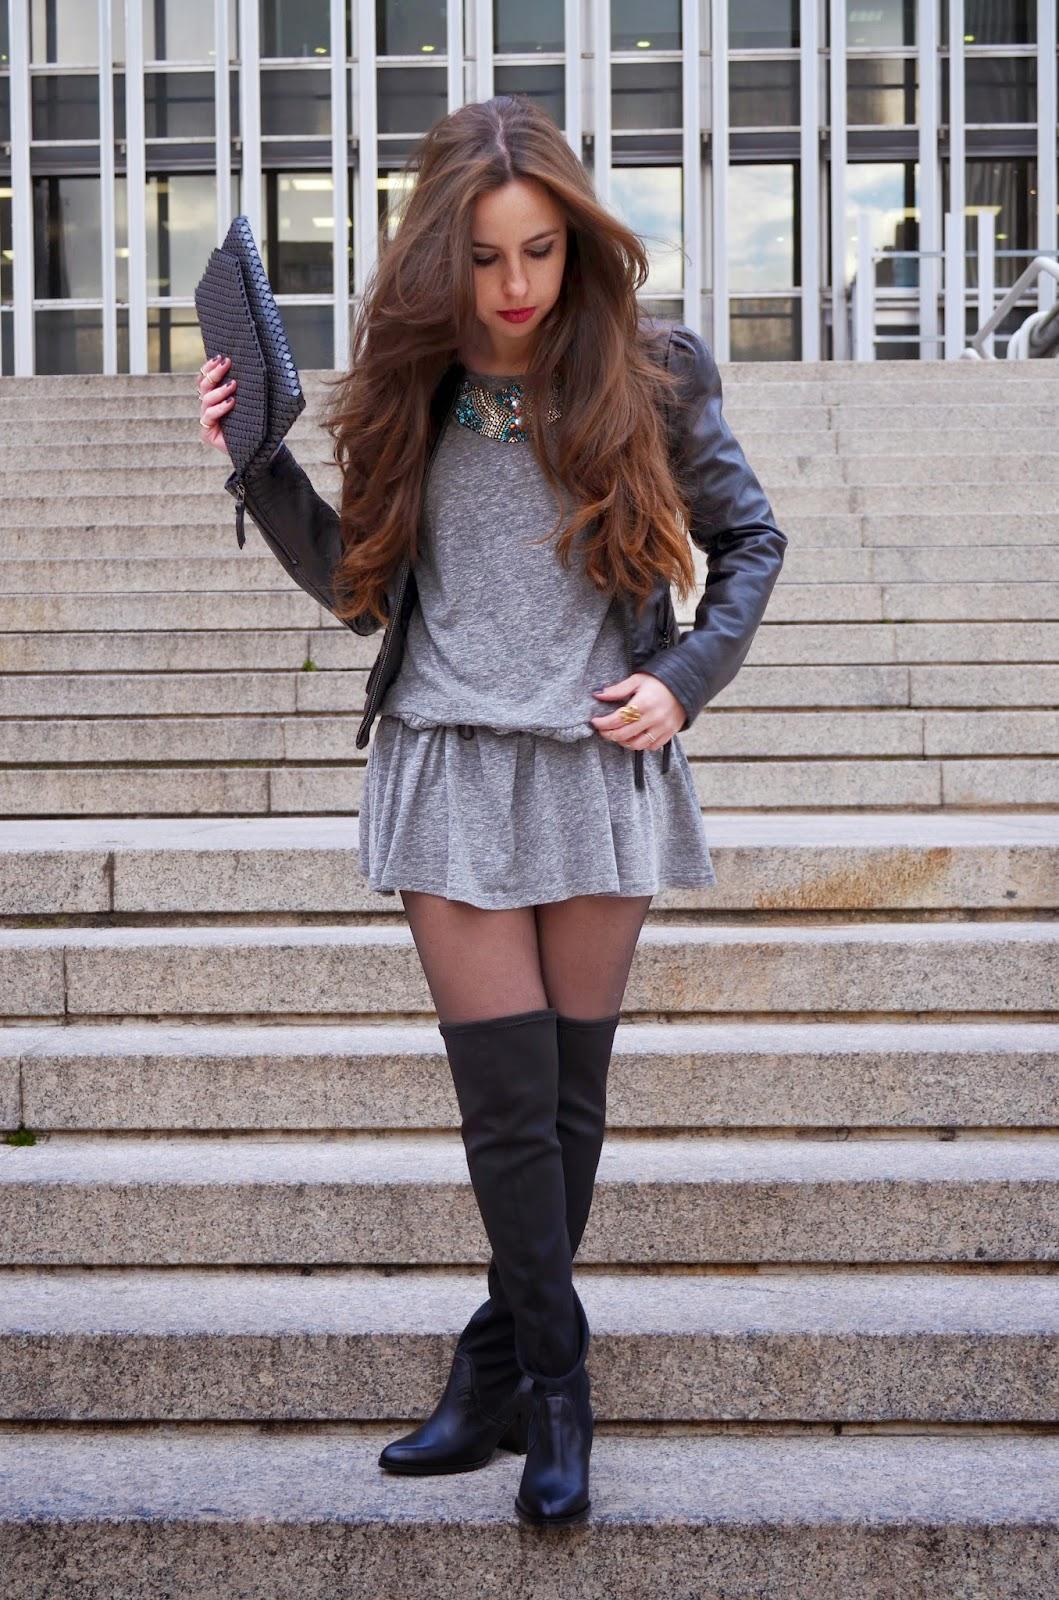 hey vicky hey, victoria suarez, san valentin, valentine's day, valentine's day outfit, girl, blogger